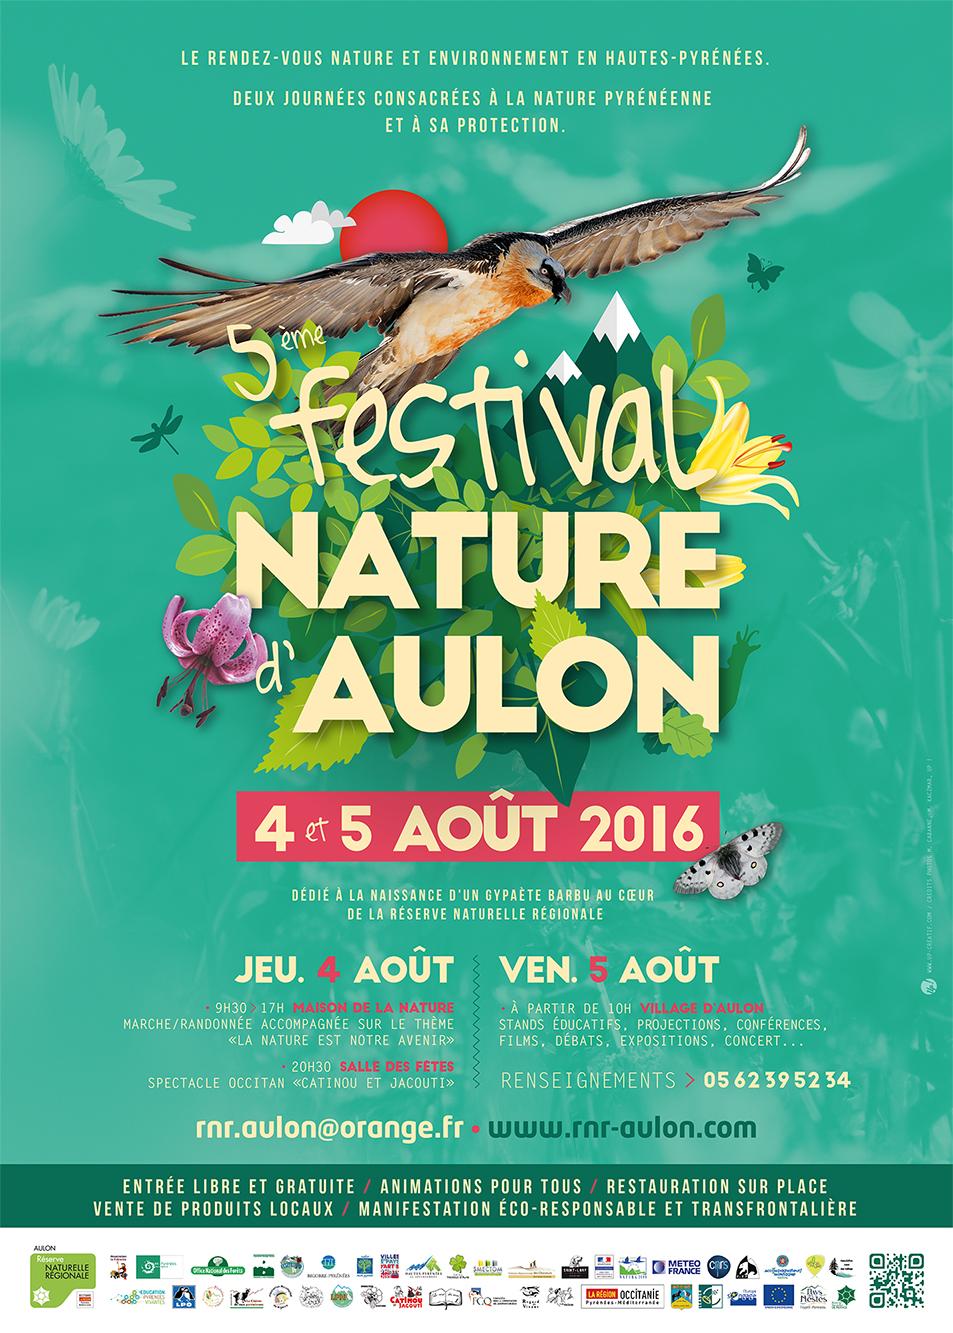 http://www.rnr-aulon.com/wp-content/uploads/2016/07/affiche_festivalnature16_web.jpg